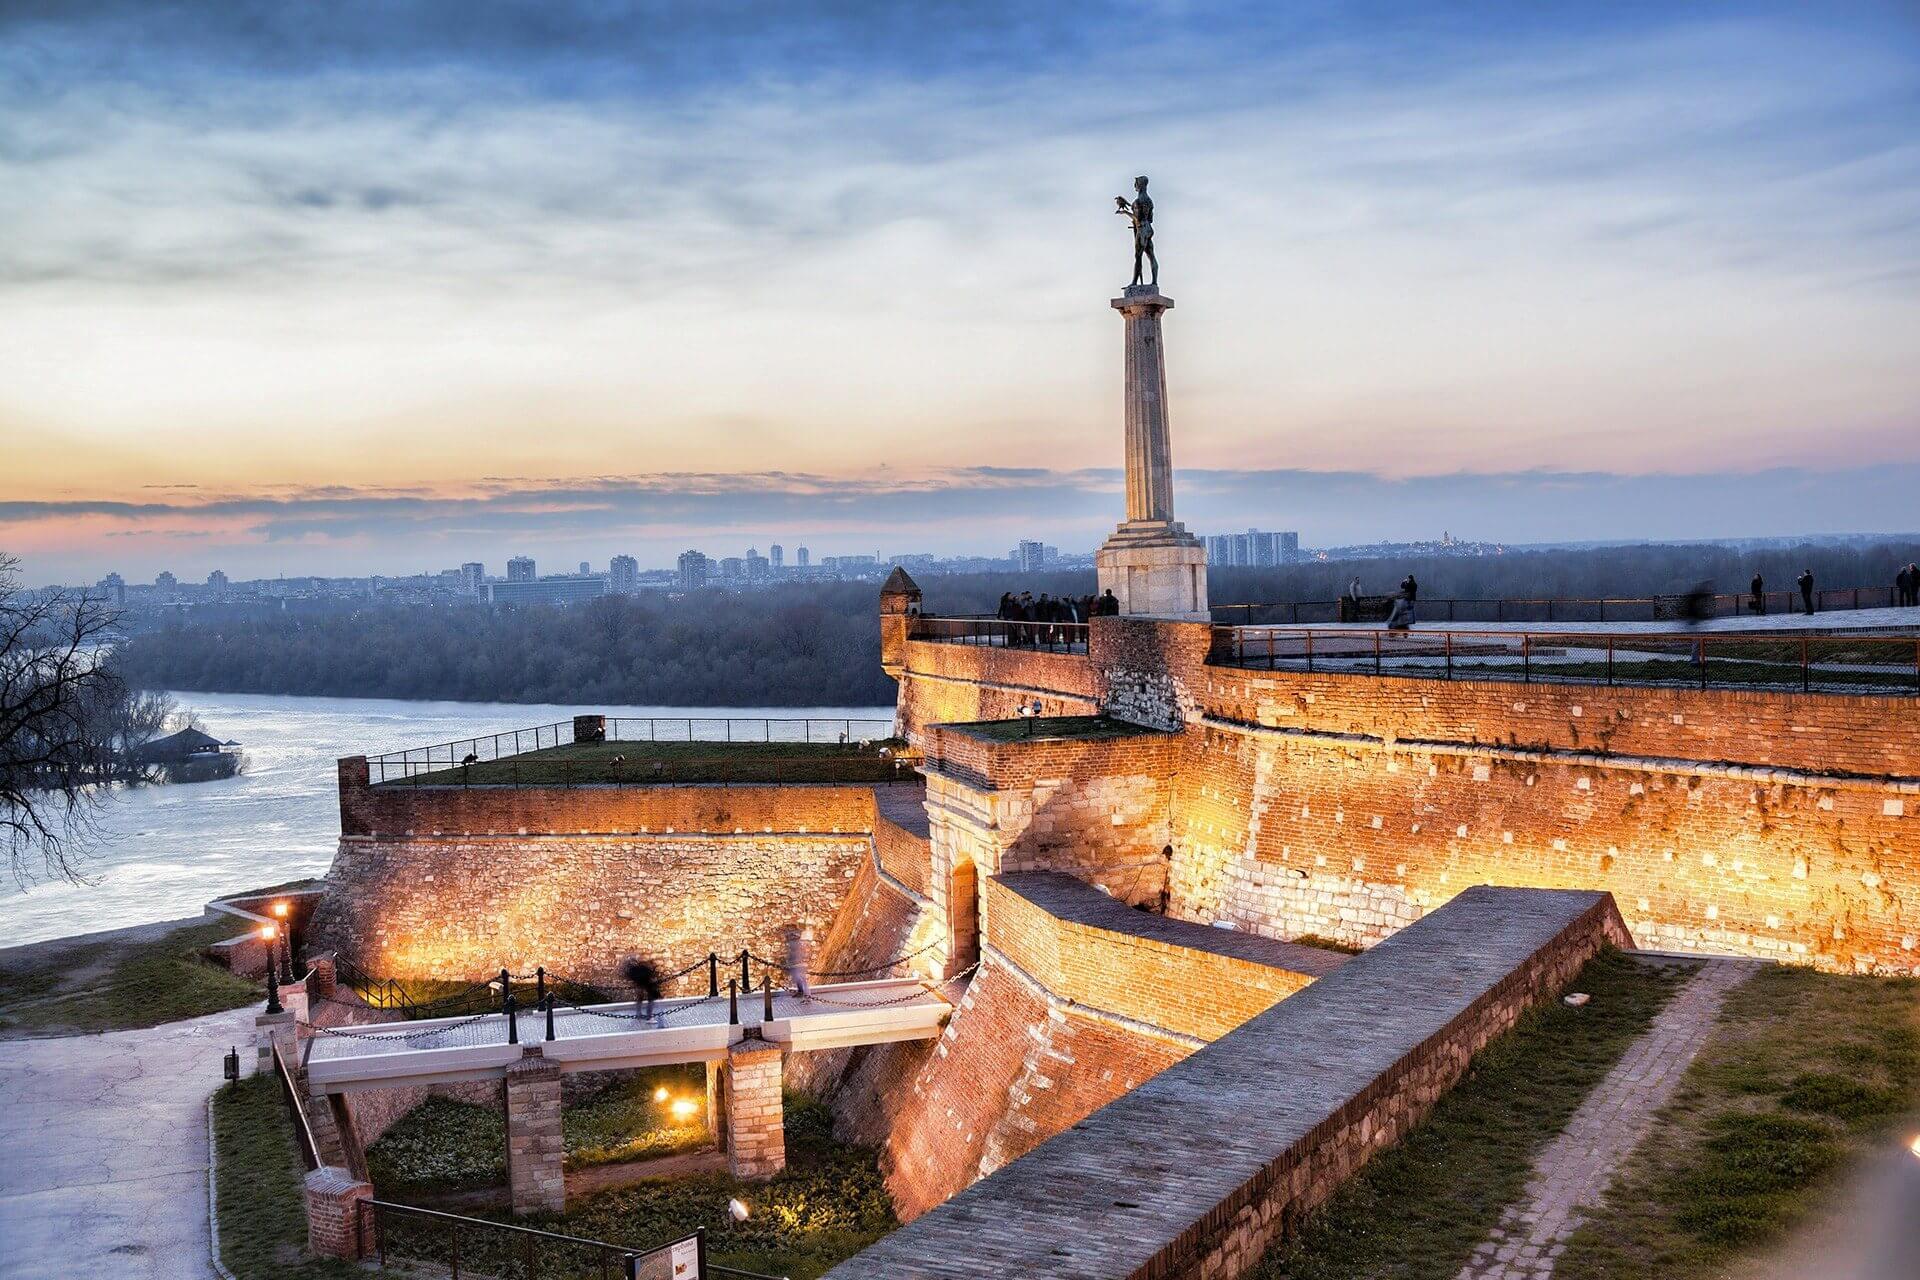 Dorćol - the oldest part of Belgrade